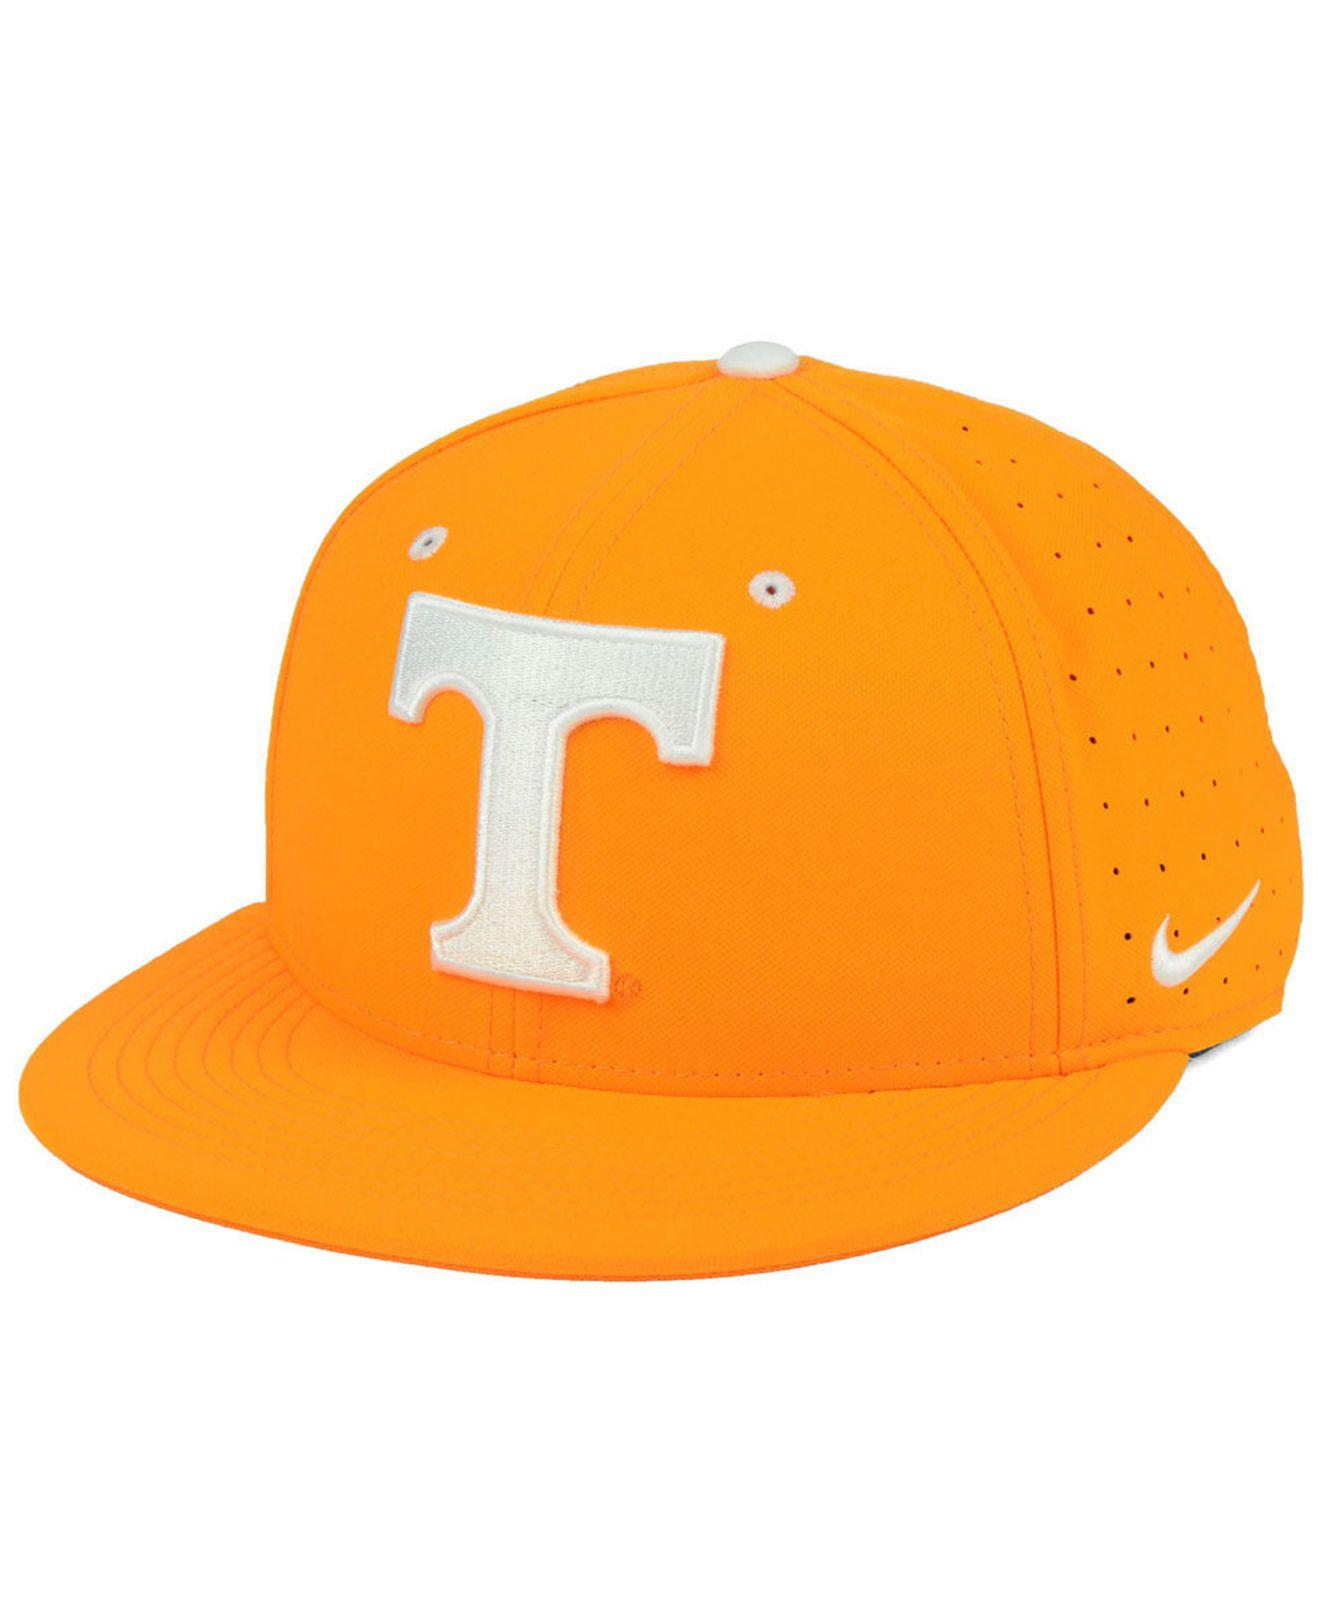 344e1da0785eb0 ... ireland nike. mens orange tennessee volunteers aerobill true fitted  baseball cap 5a6d7 1778b